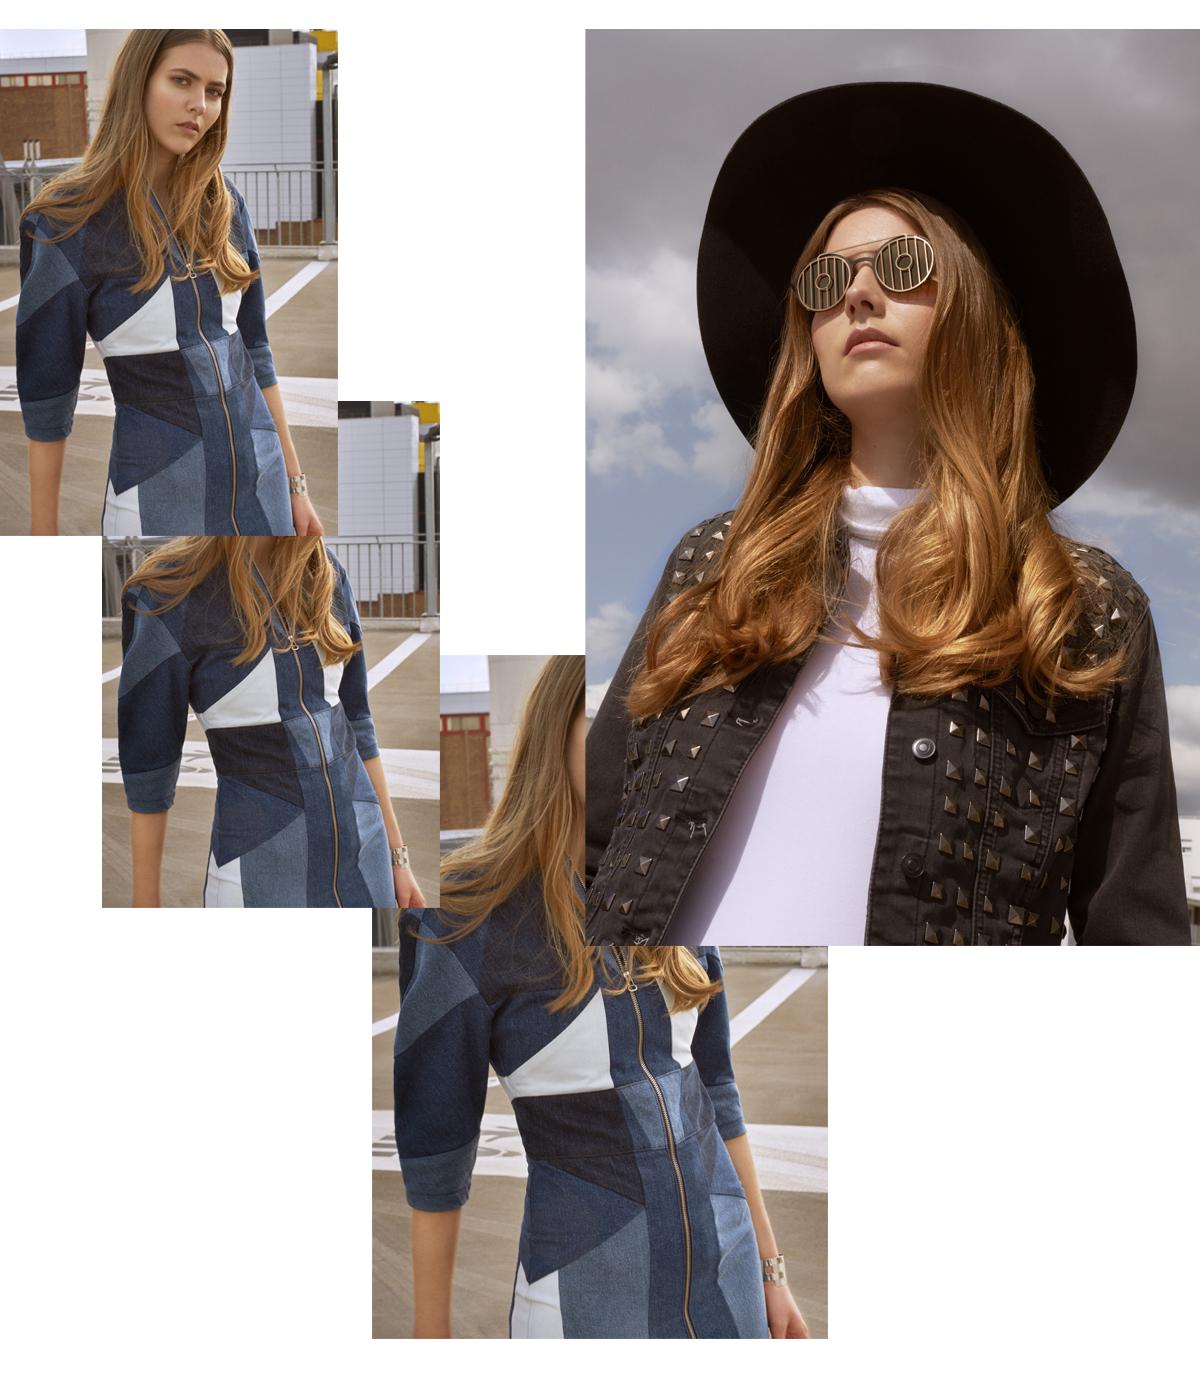 denim dress patchwork maje ursul bracelet star wars sunglasses R2D2 model fashionstory urban girl folk stylemkt studio styling laurent desgrange photography sylvain la rosa